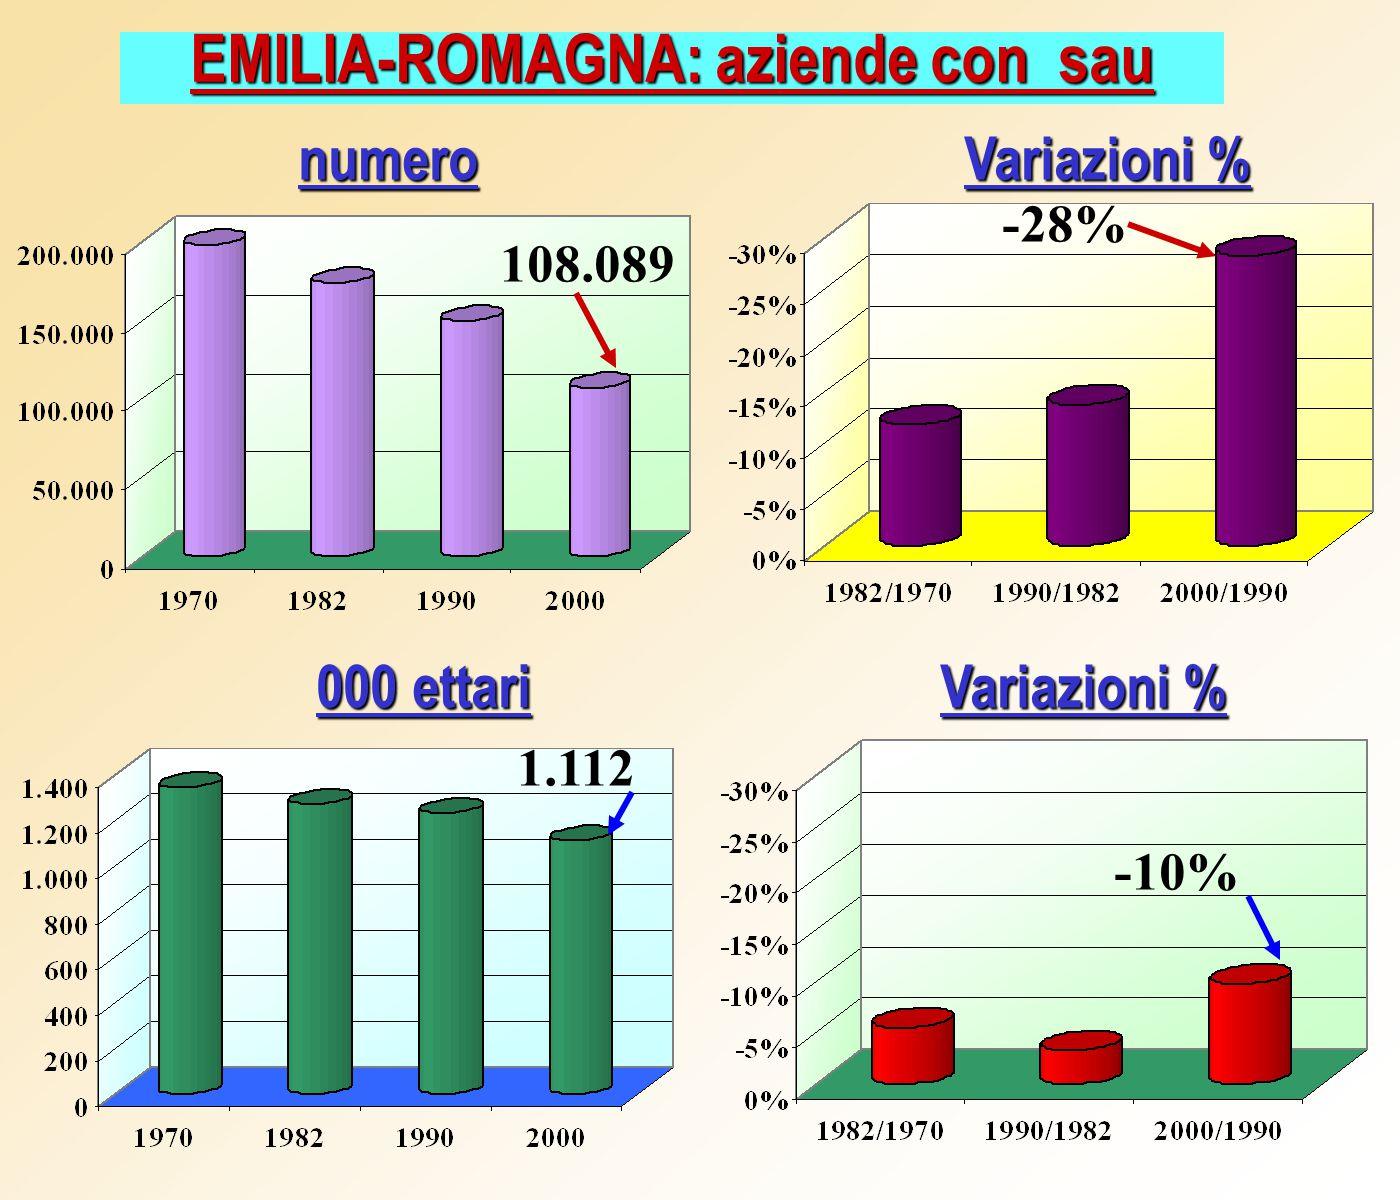 EMILIA-ROMAGNA: aziende con sau Variazioni % numero 000 ettari Variazioni % 108.089 -28% 1.112 -10%